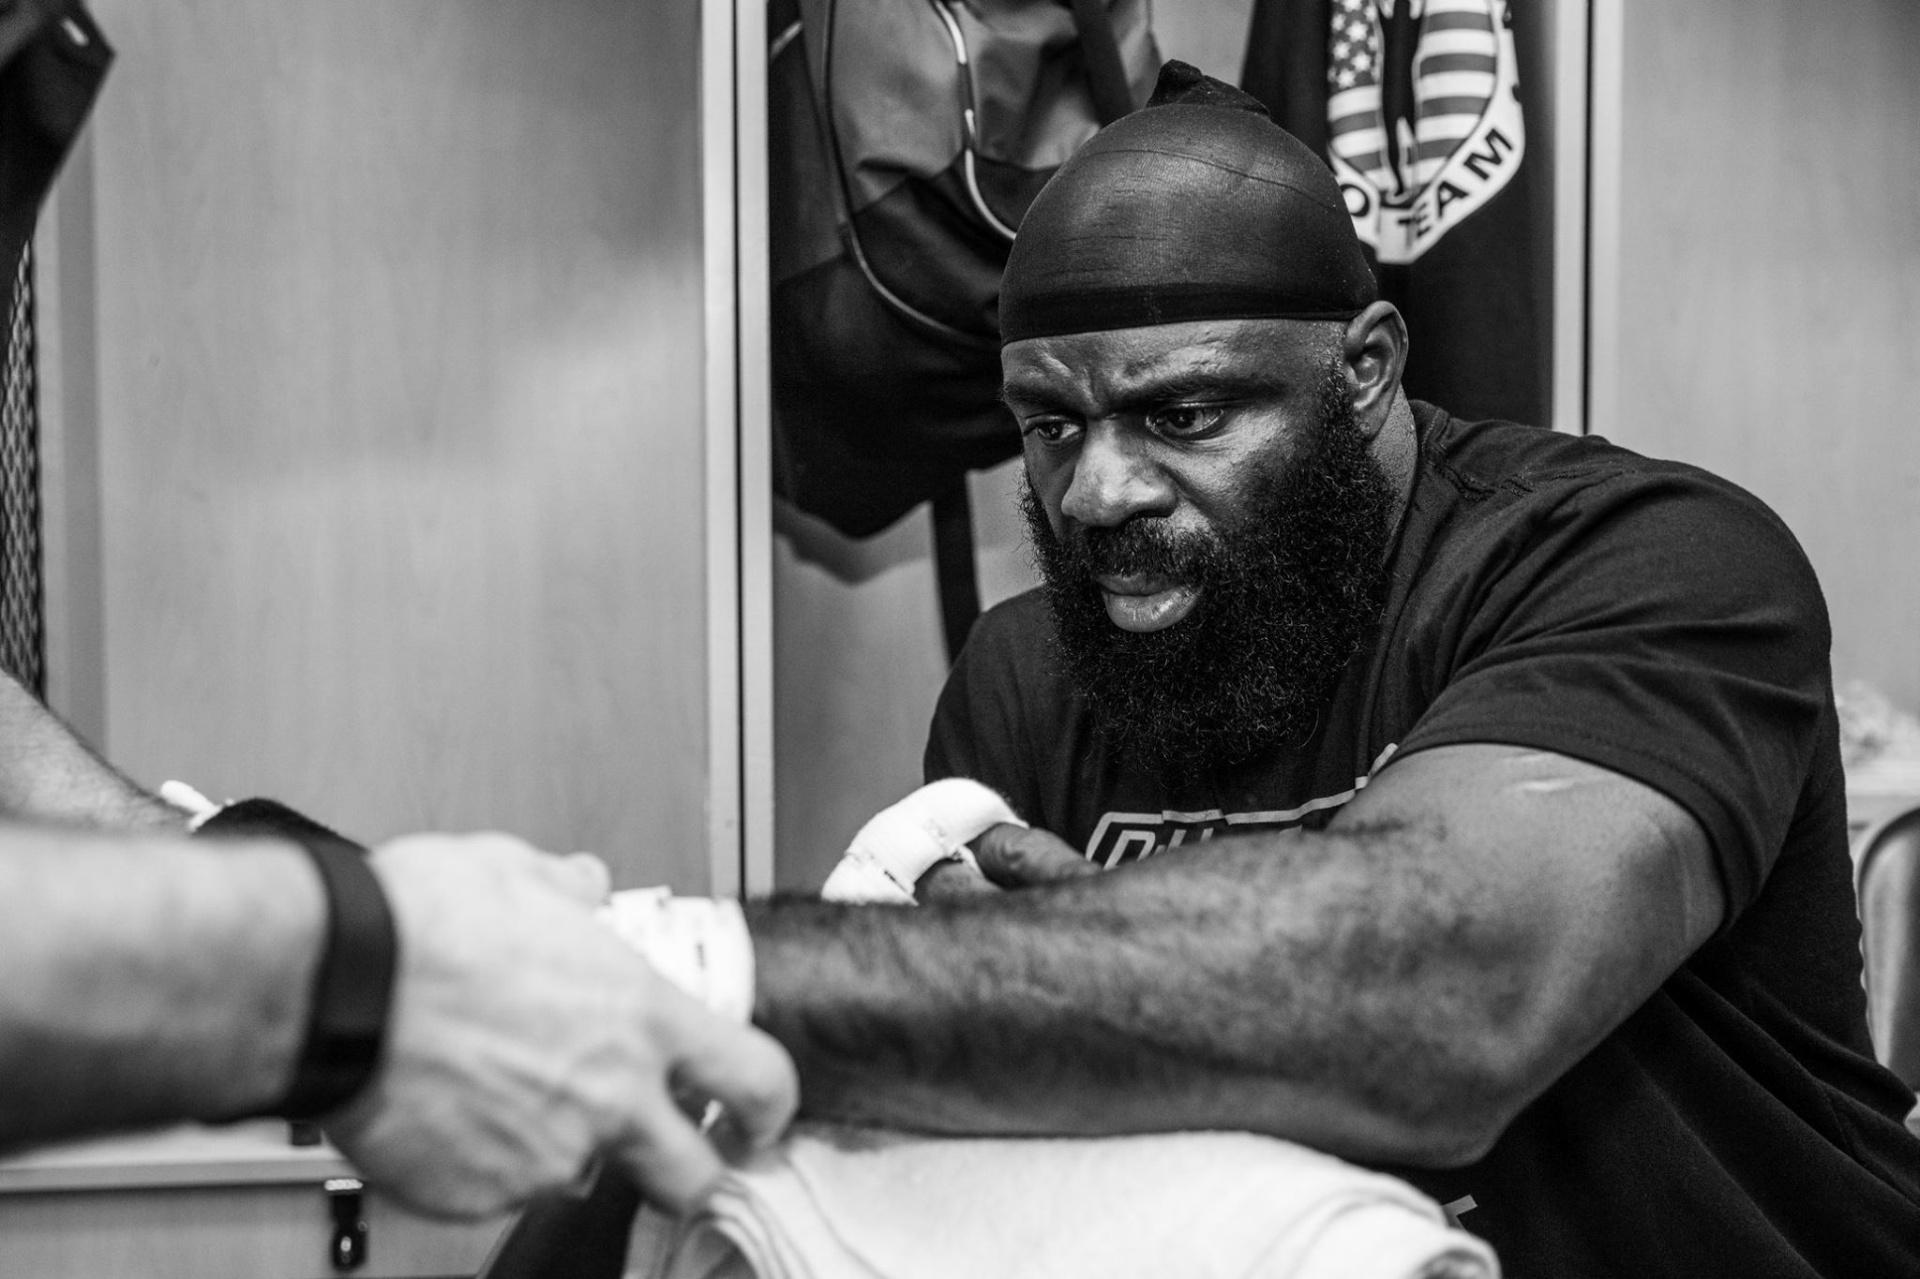 Kimbo Slice se prepara para o combate no Bellator